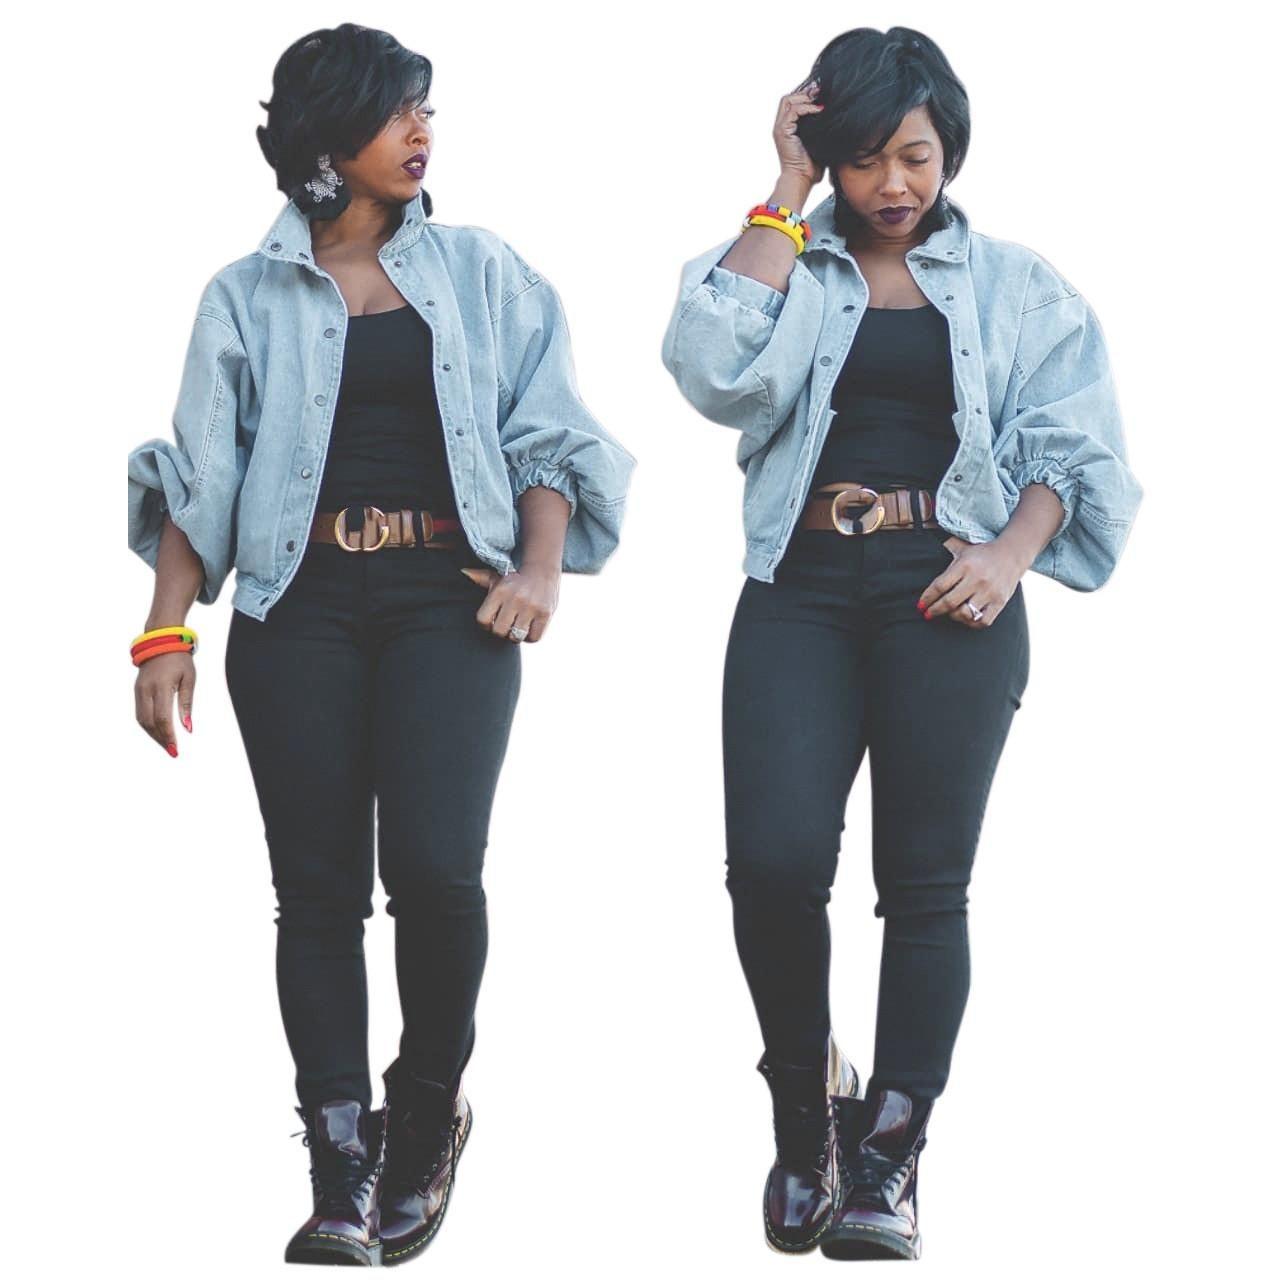 Giacca designer donne Moda Vintage manica lunga Jean Jacket Womens Abbigliamento casual